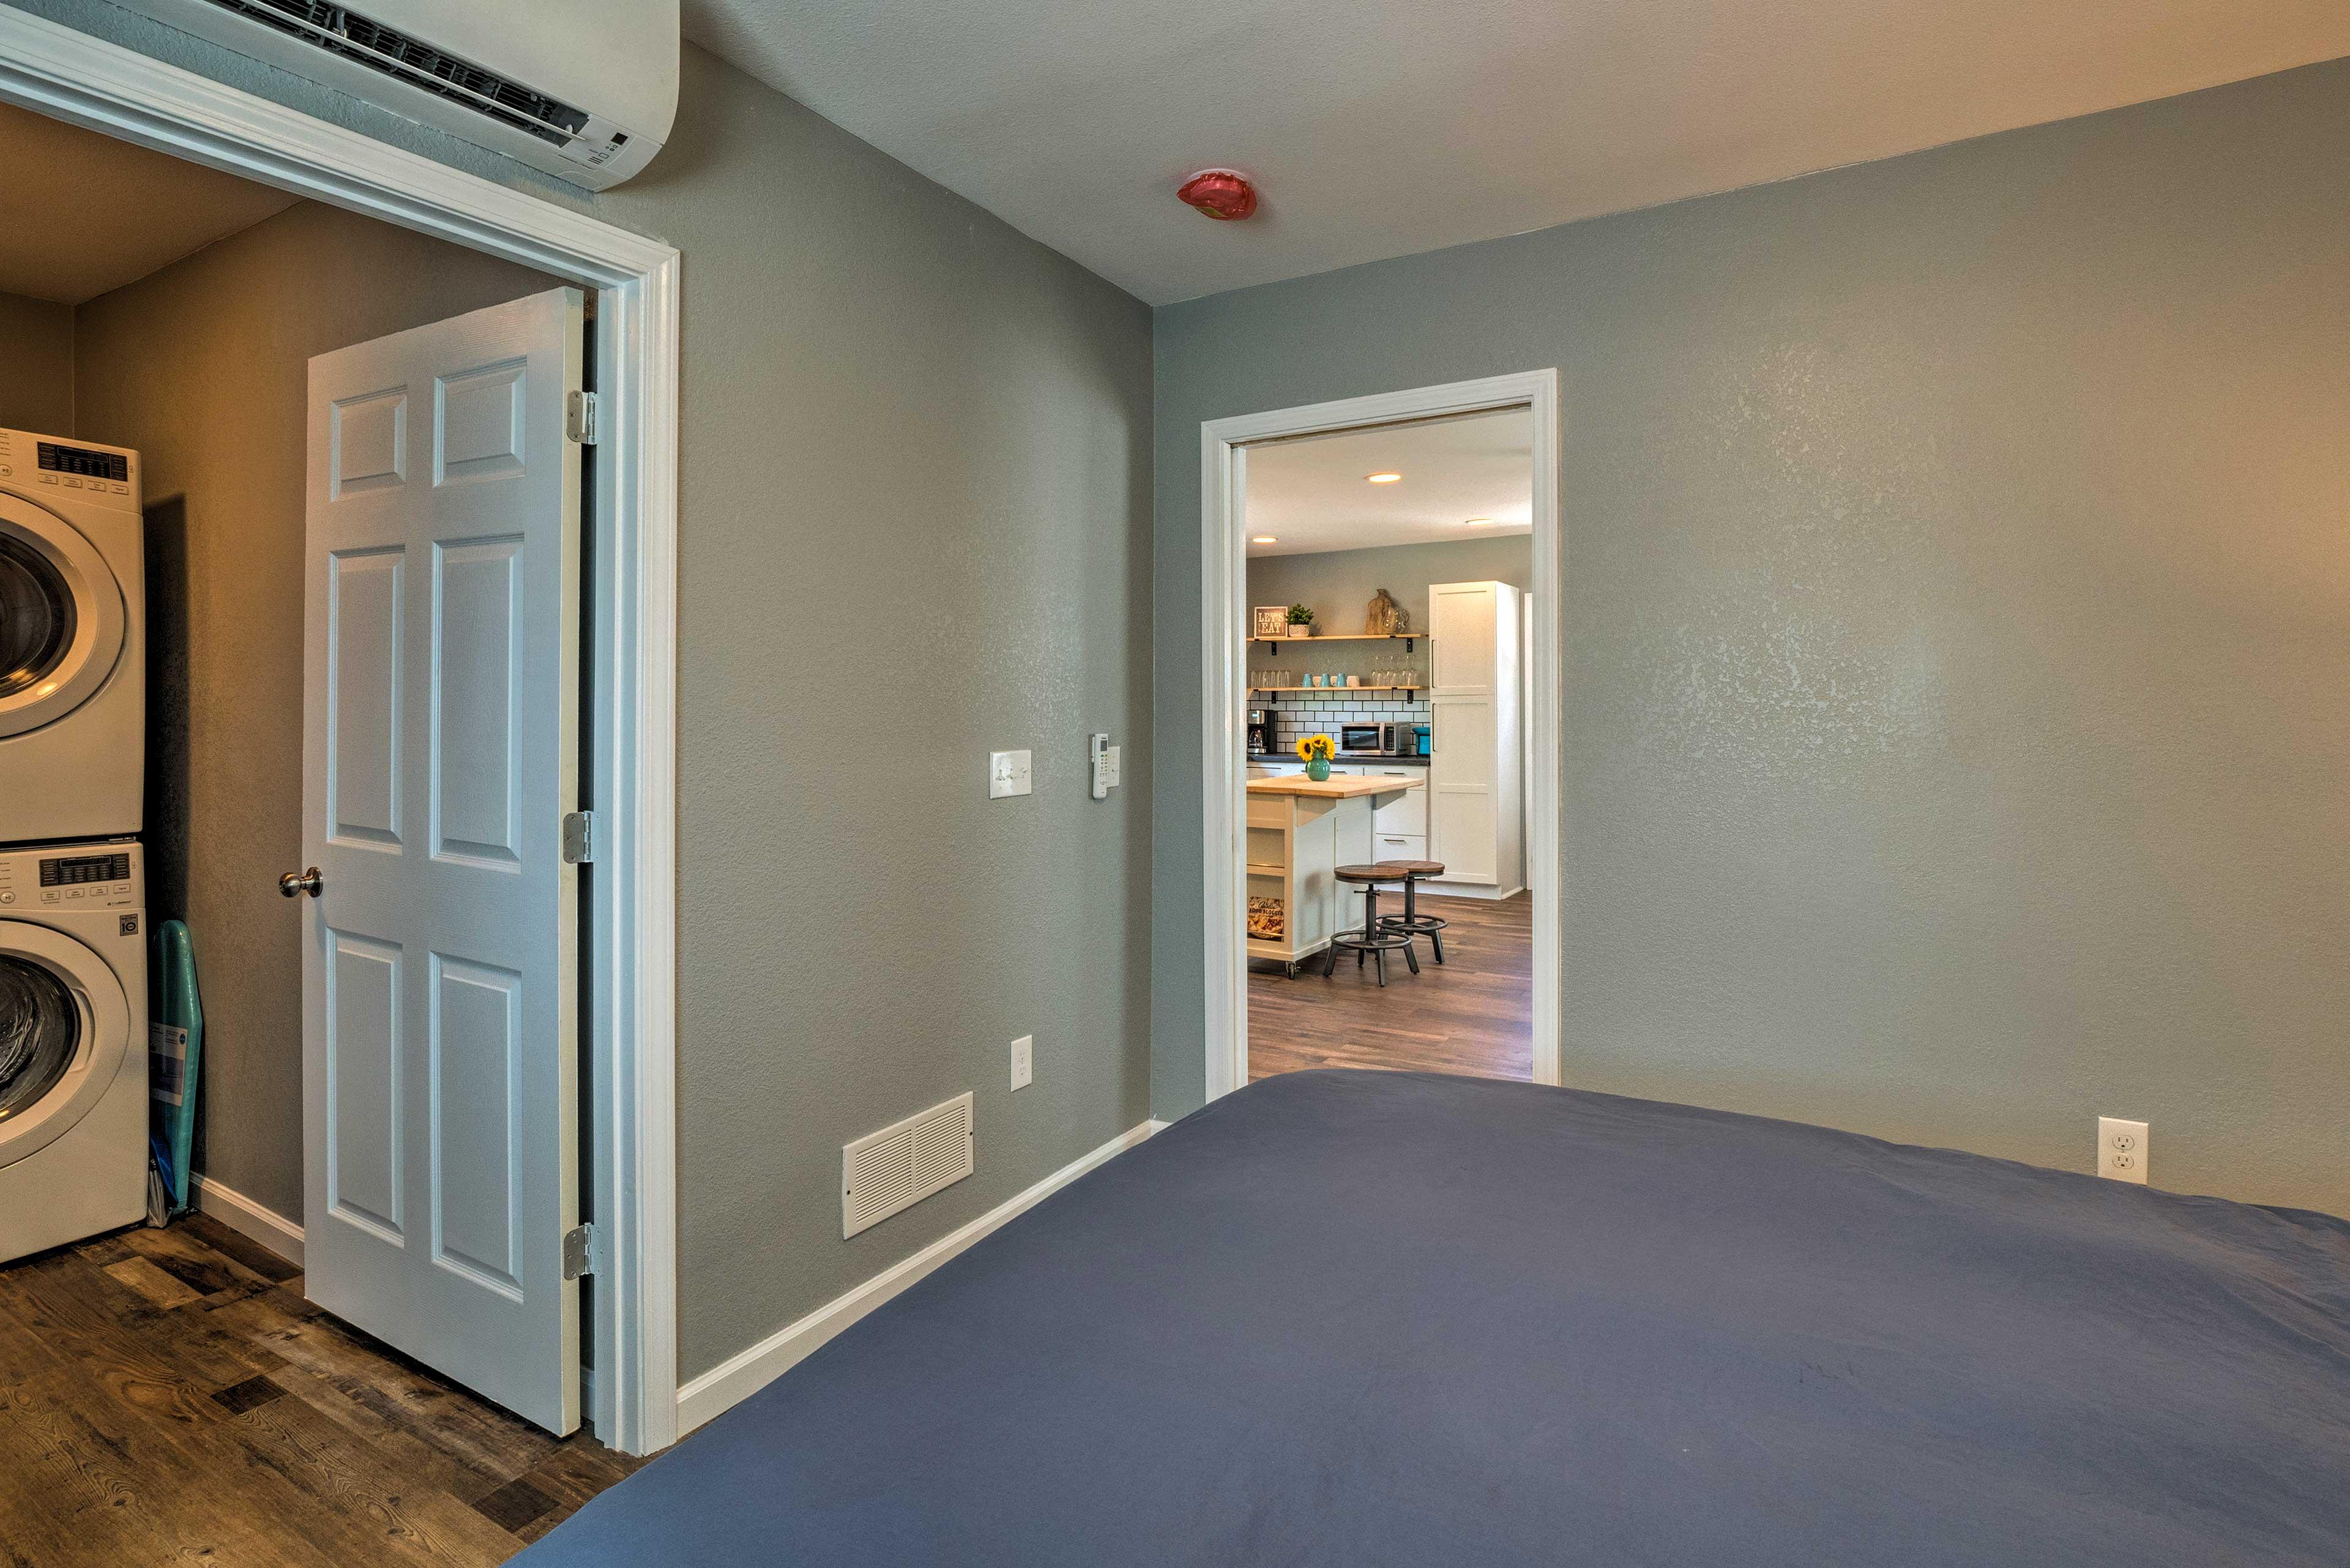 Bedroom | Wall-Unit Air Conditioning | Closet